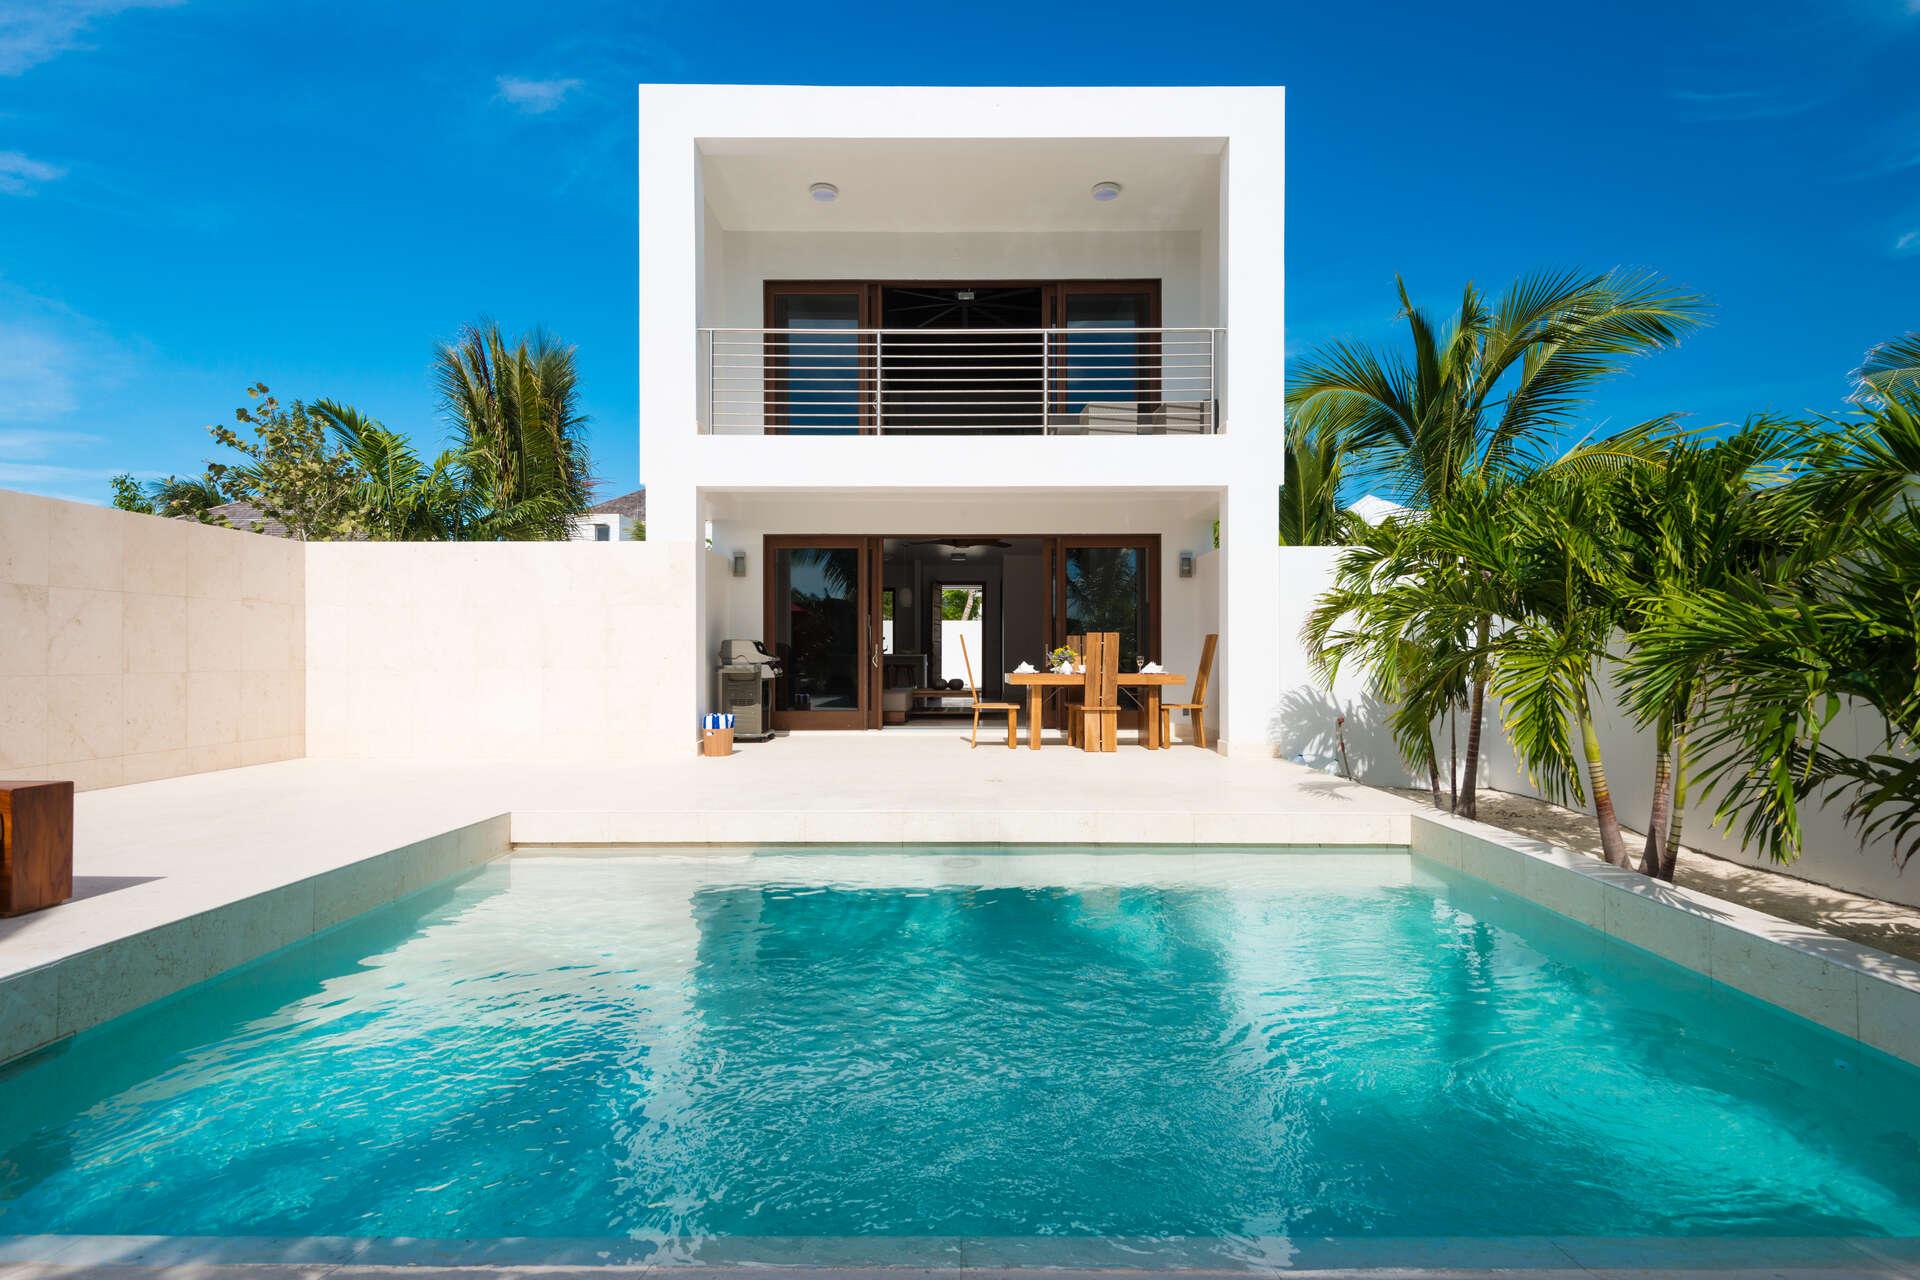 Luxury villa rentals caribbean - Turks and caicos - Providenciales - Turtle cove - Sugar Kube - Image 1/13